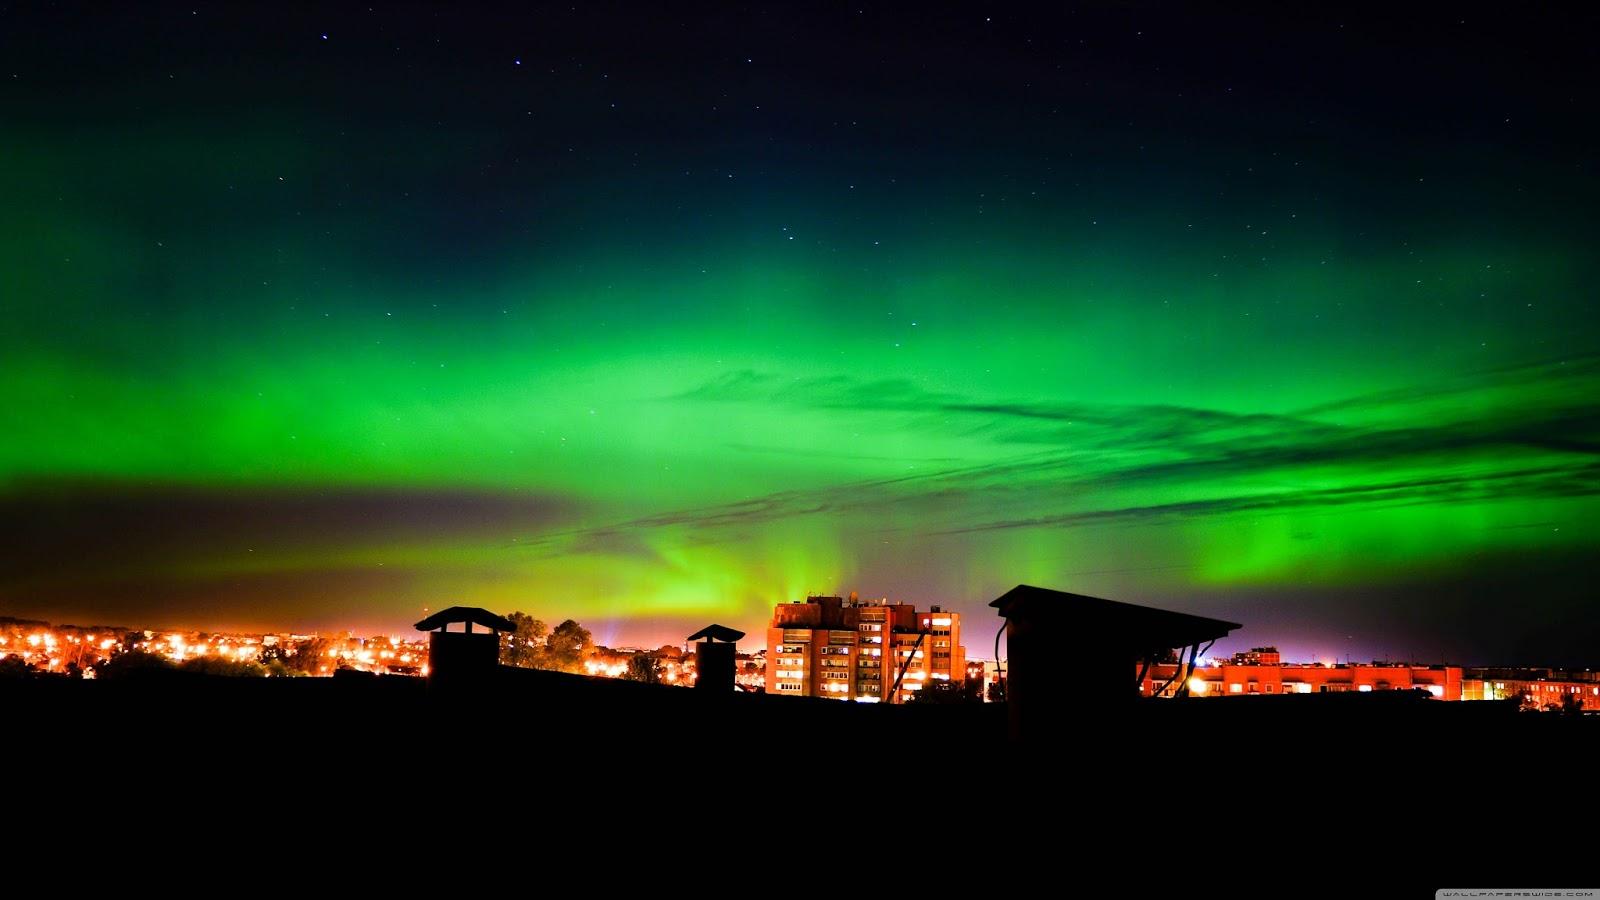 northern lights wallpaper 4k - photo #29